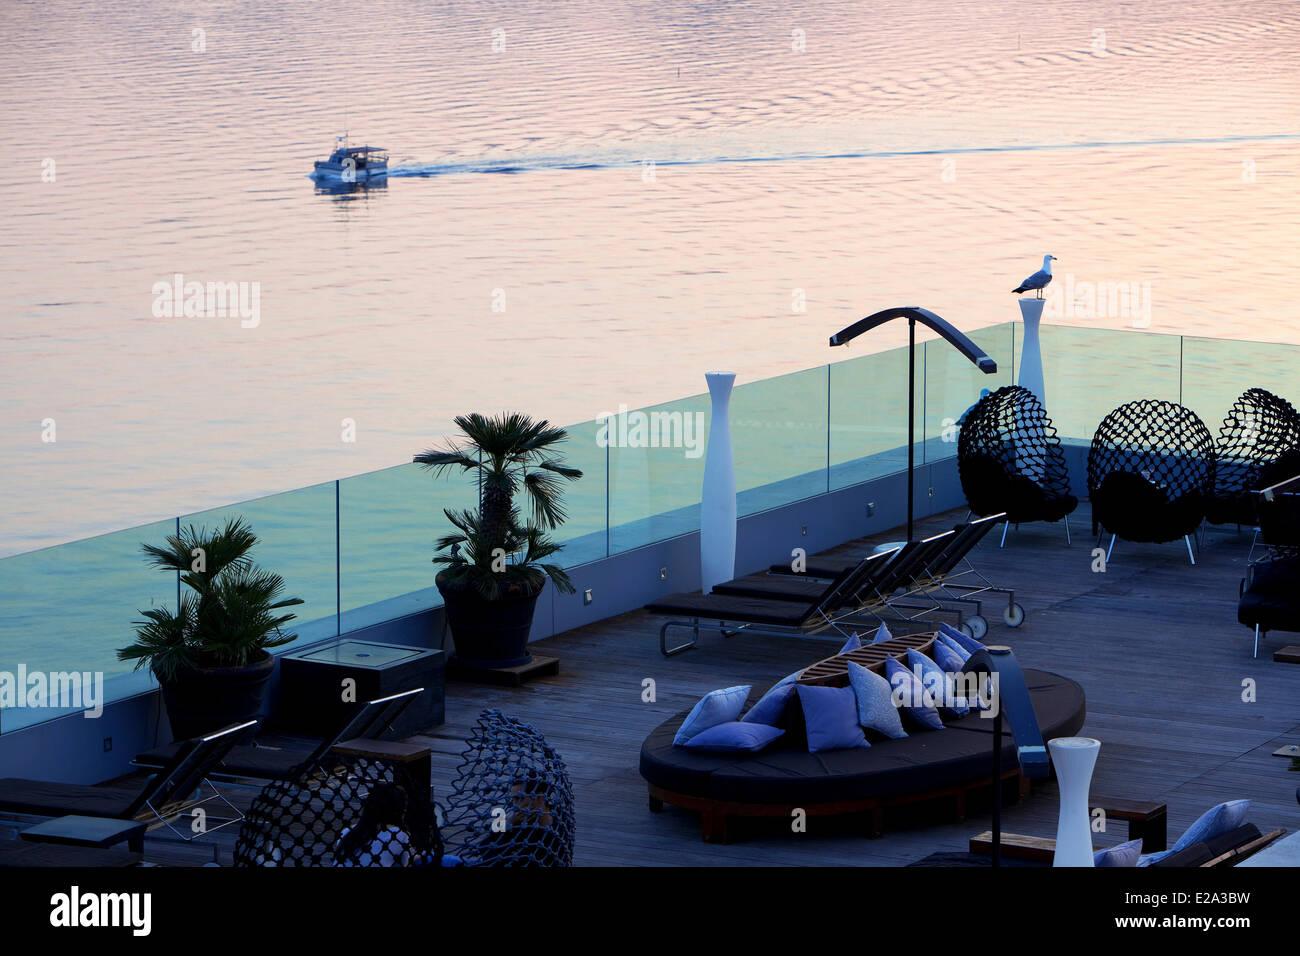 France, Alpes Maritimes, Cannes, Hotel Radisson Blu, roof terrace - Stock Image